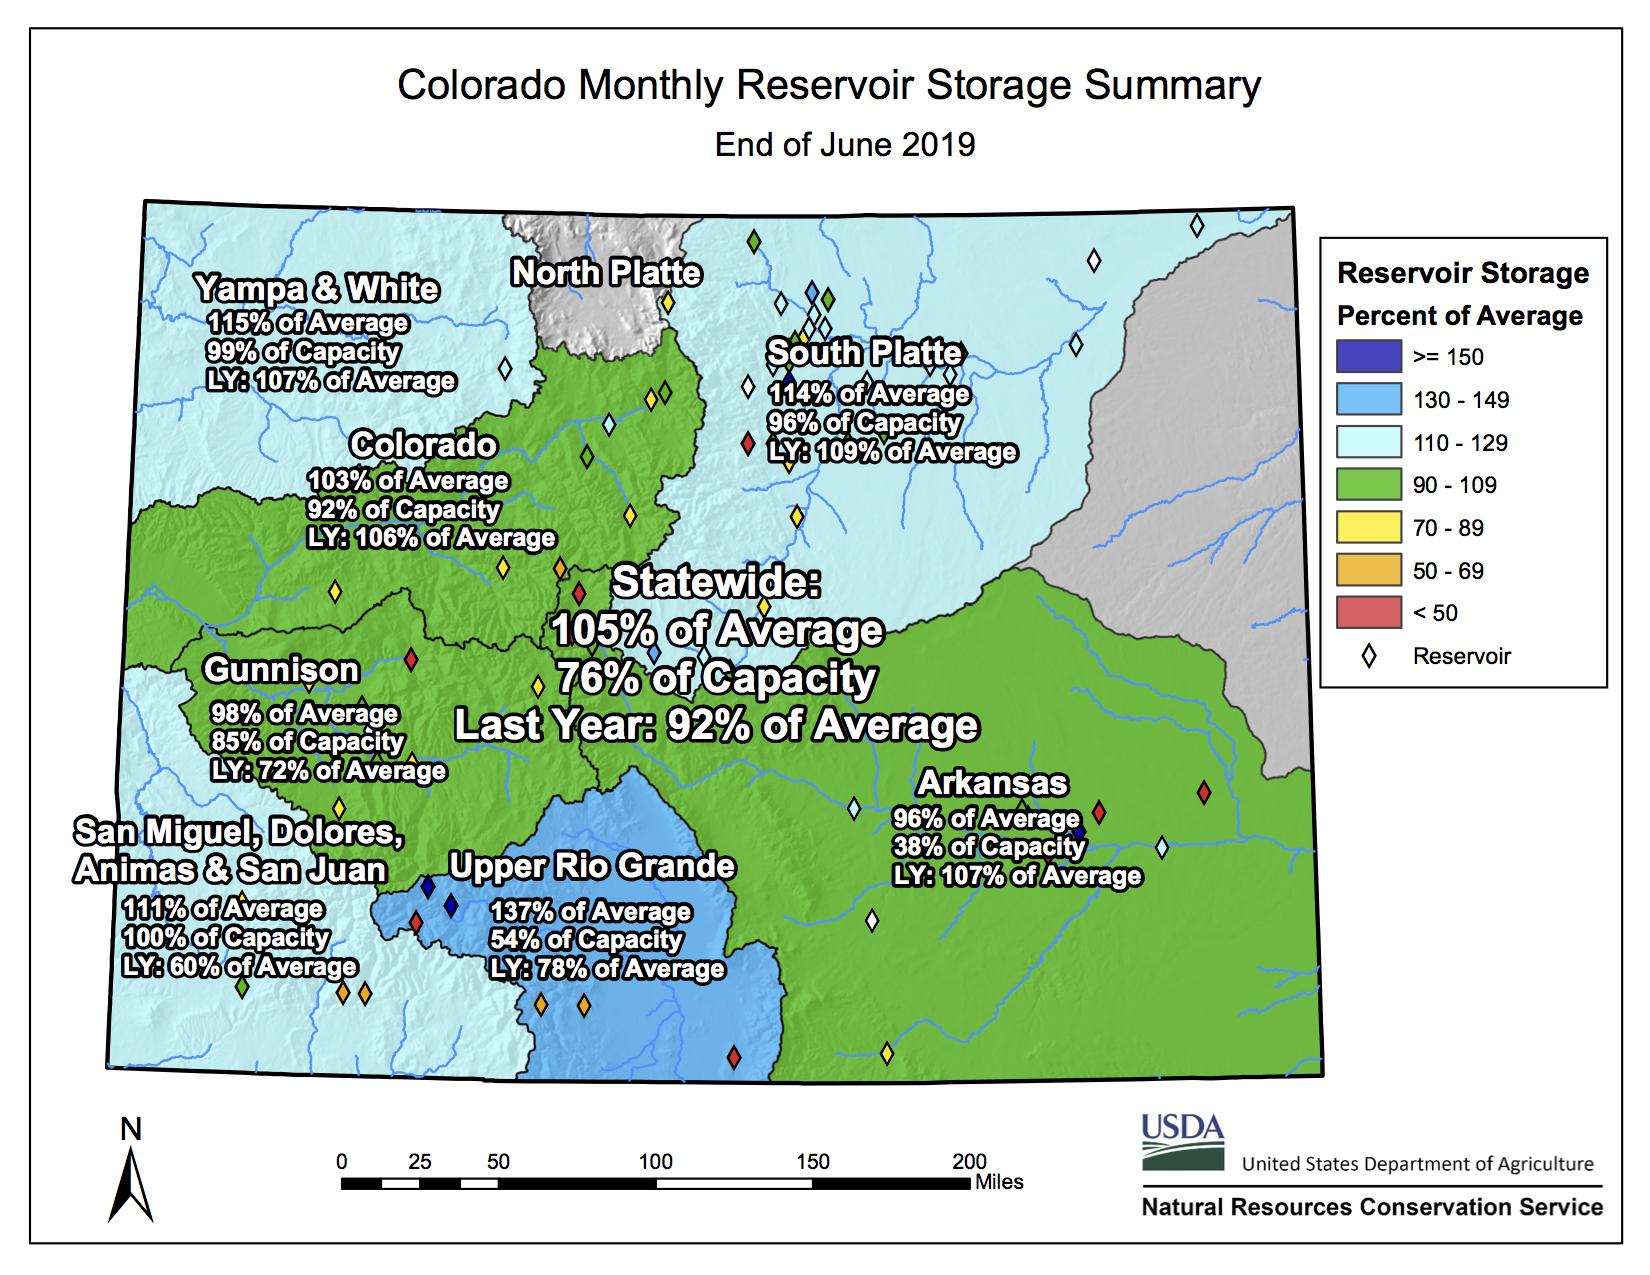 Reservoir Storage Map June 2019